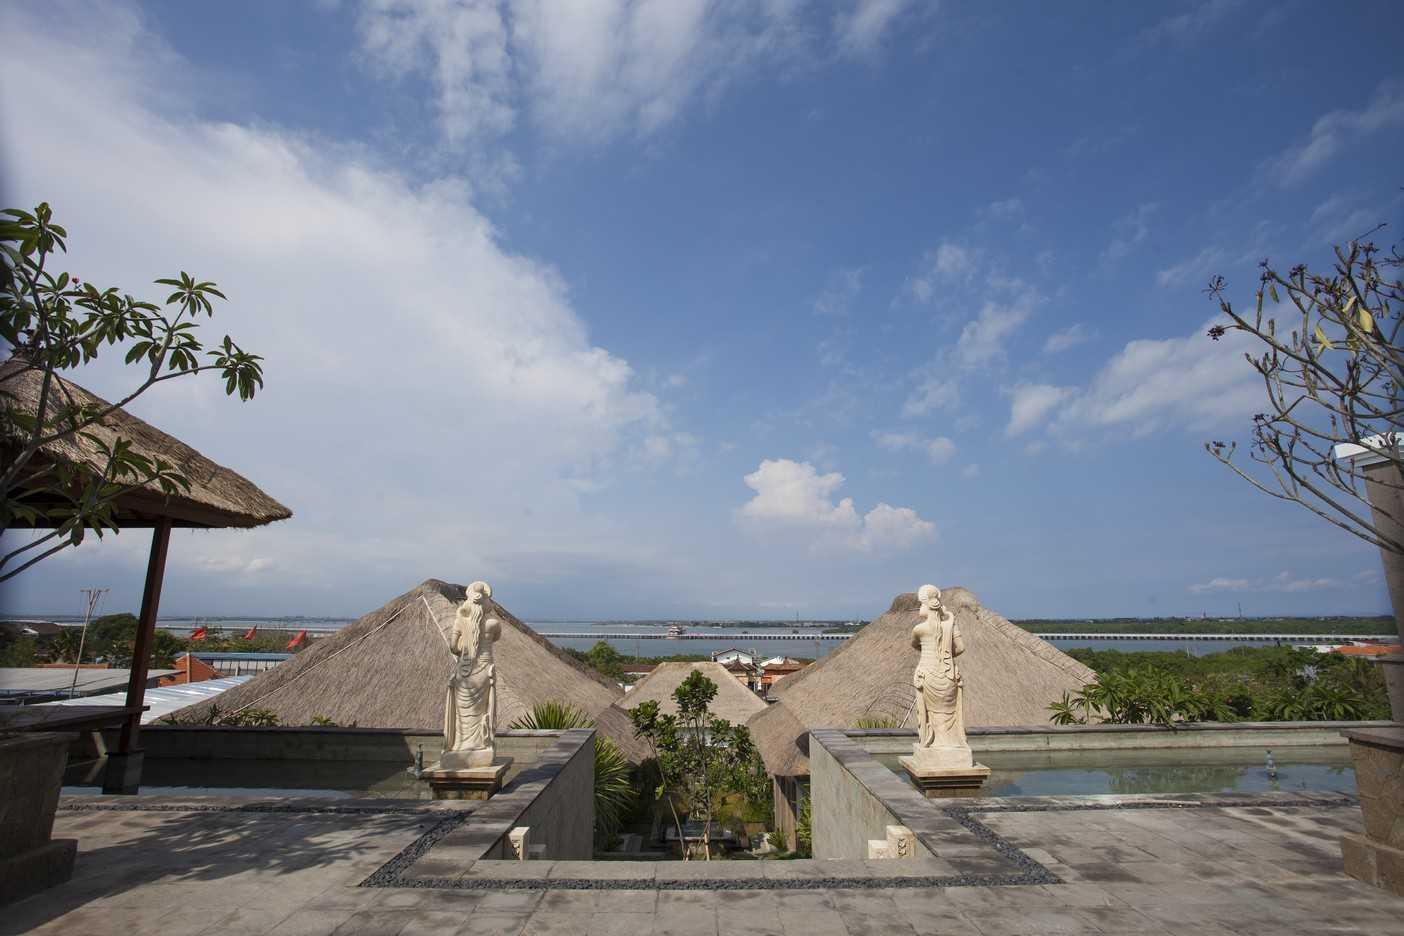 Emporio Architect Zen Family Spa Nusa Dua Benoa, Kec. Kuta Sel., Kabupaten Badung, Bali, Indonesia Benoa, Kec. Kuta Sel., Kabupaten Badung, Bali, Indonesia Emporio-Architect-Zen-Family-Spa-Nusa-Dua  72697